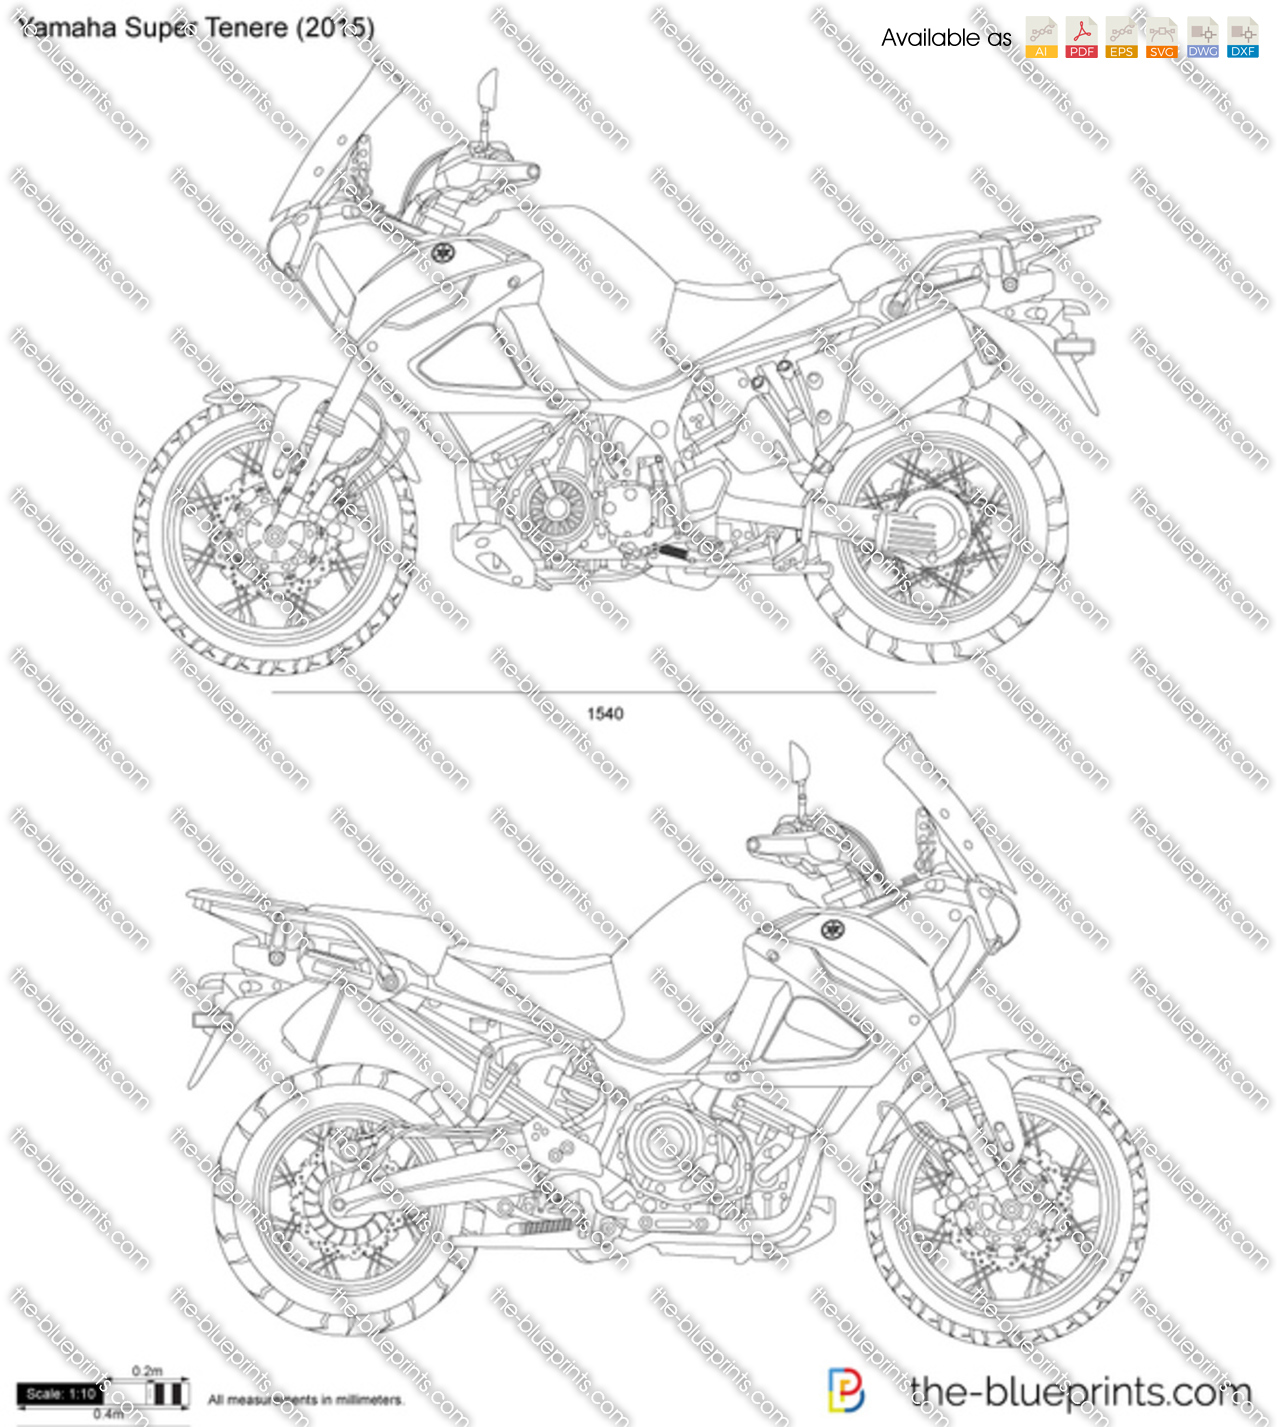 Yamaha Super Tenere 2016